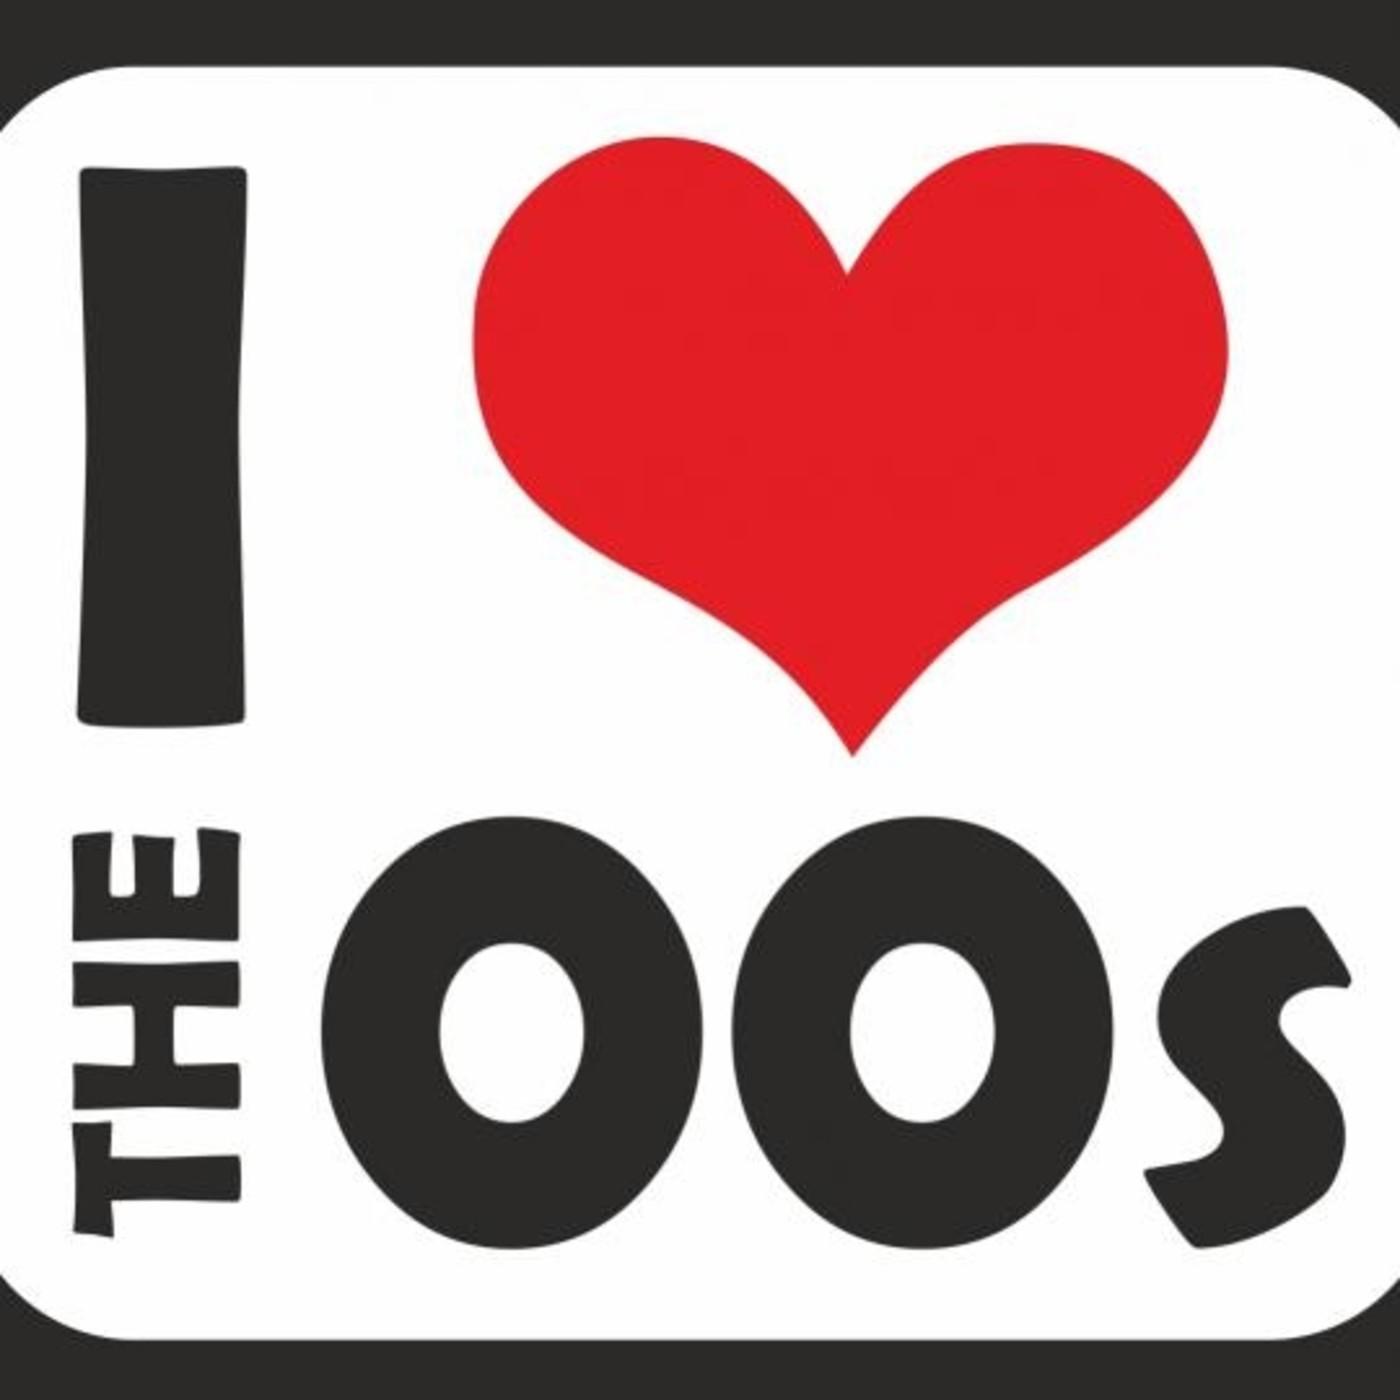 love-the-tuenti's-00-#yomequedoencasabailando